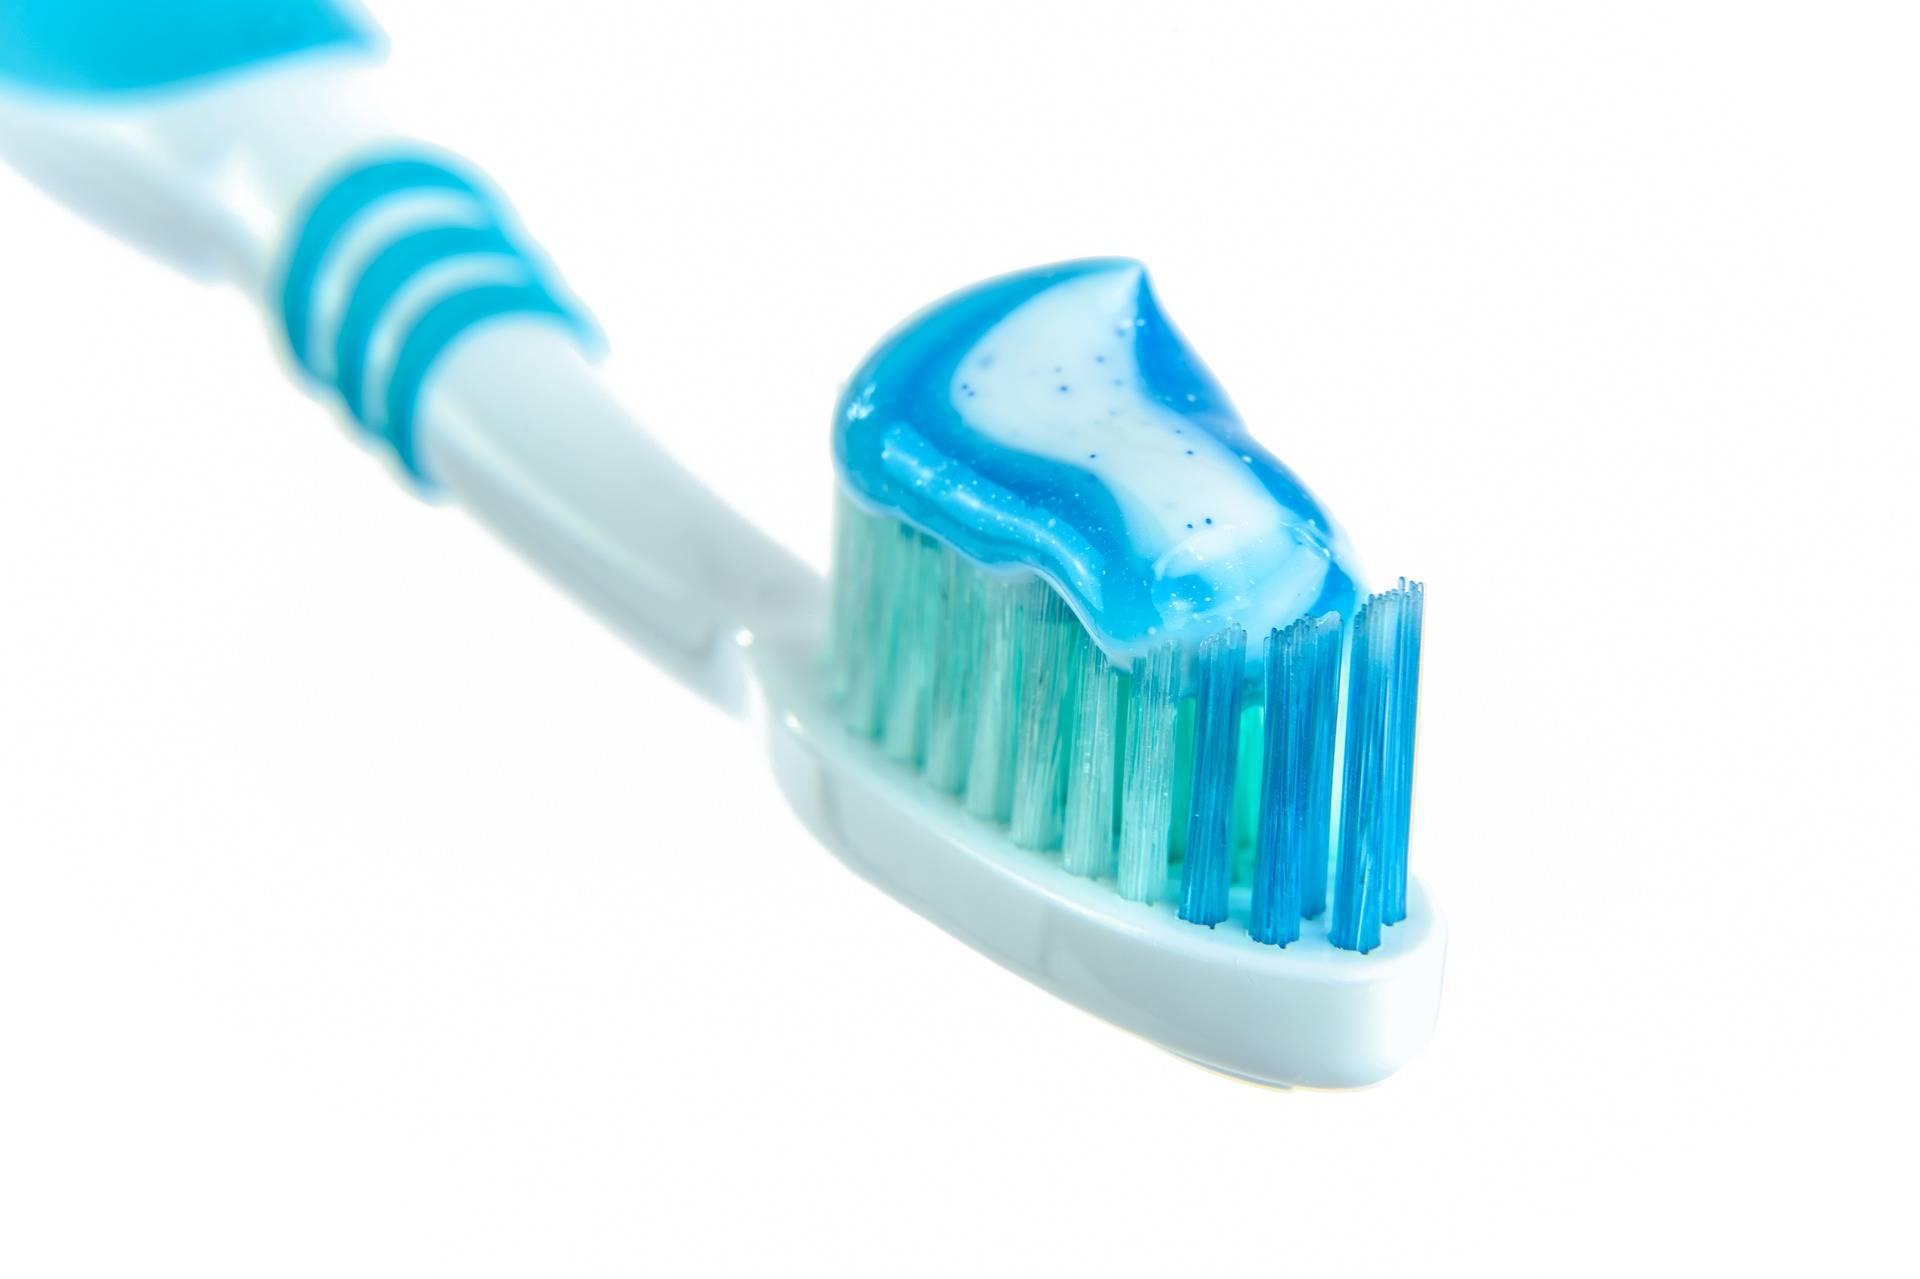 331091e567d1d119beac_toothpaste-1786388_1920.jpg